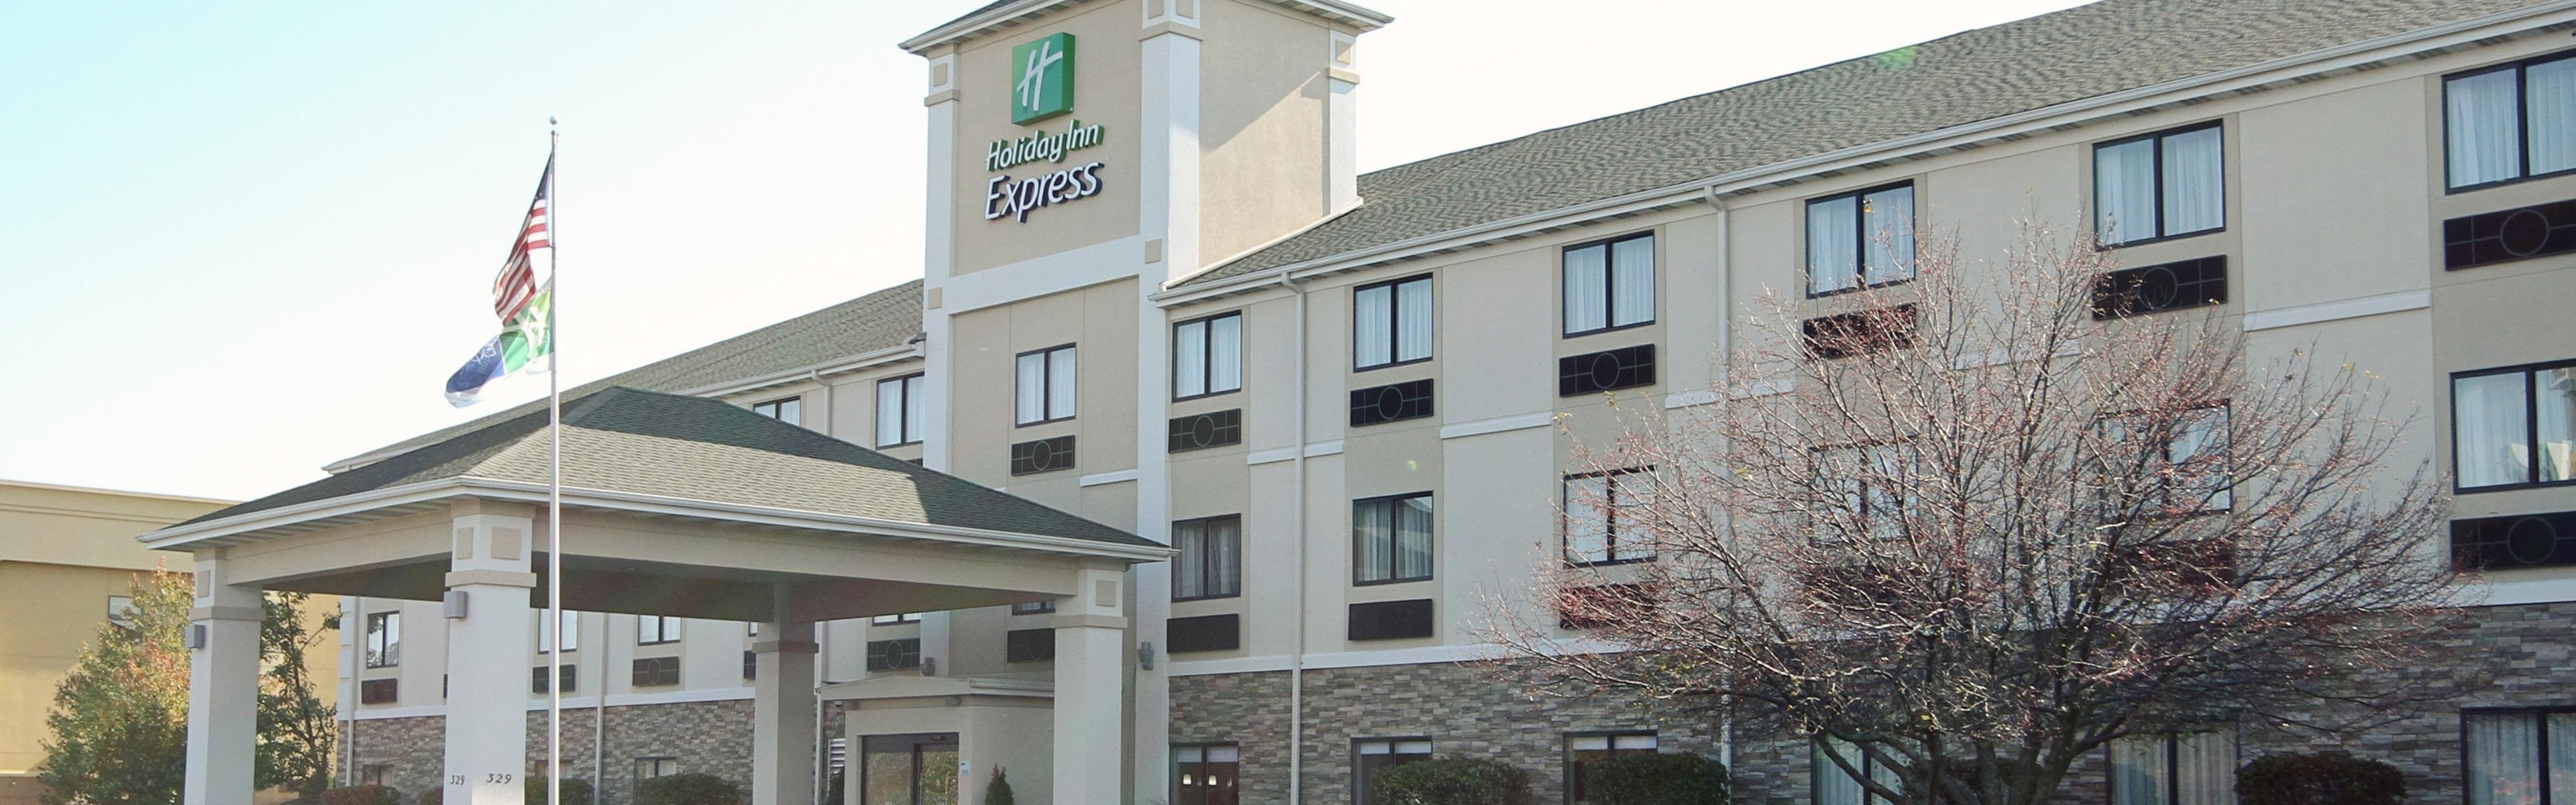 Holiday Inn Express Marshall image 0